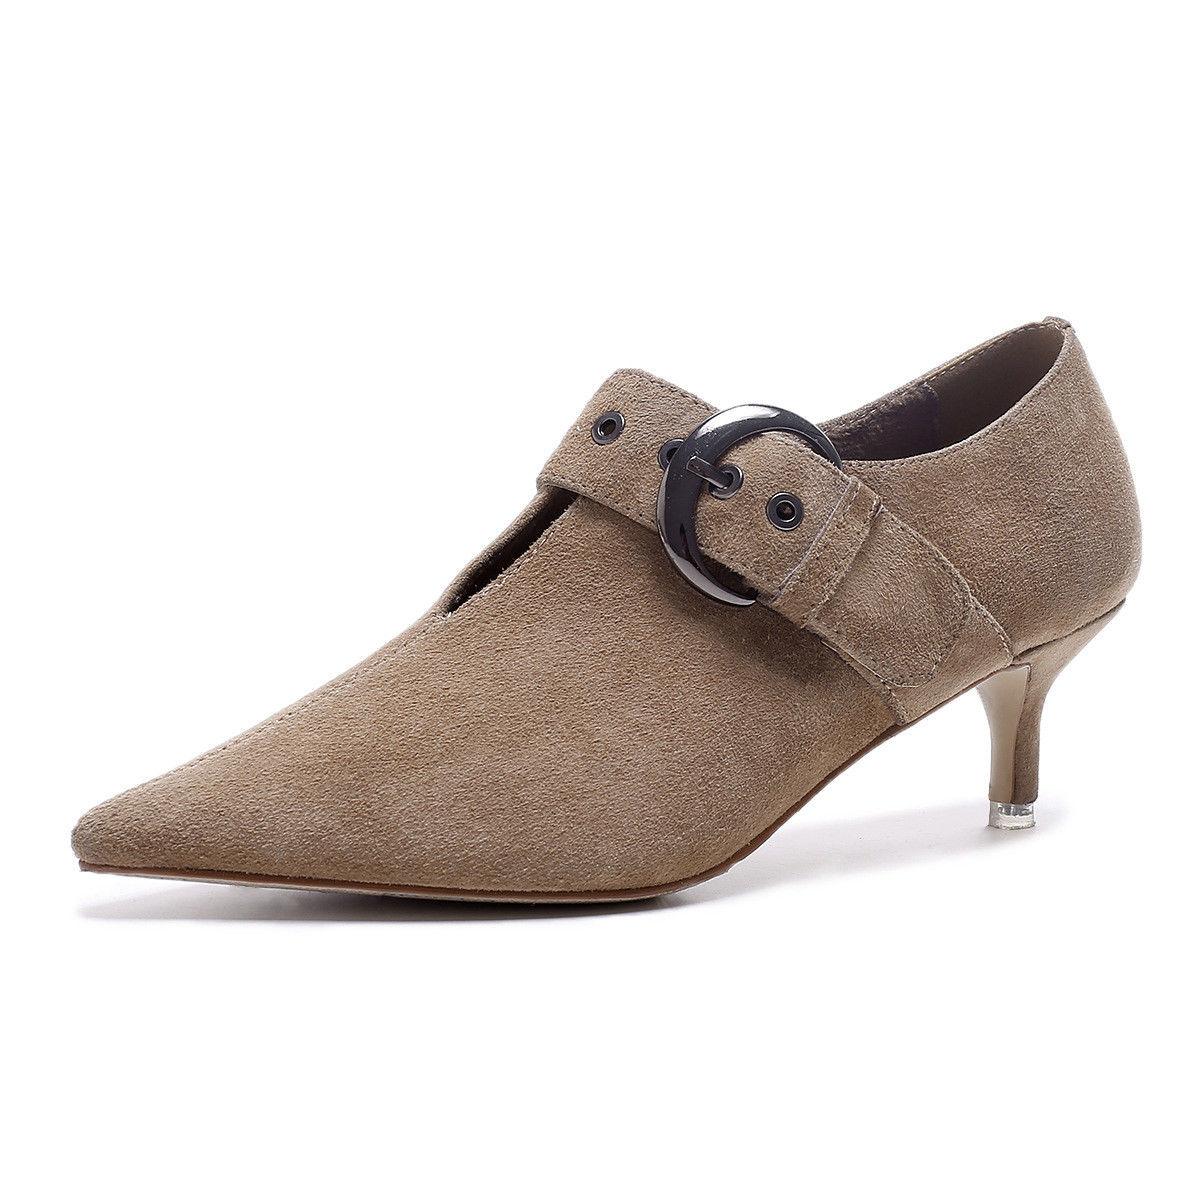 Women Pointed Toe Kitten Heels Suede Shoes 2017 New Fall Belt Buckle Low Heel Witch Shoes Ladies Vintage Style Female Bootie kitten heels